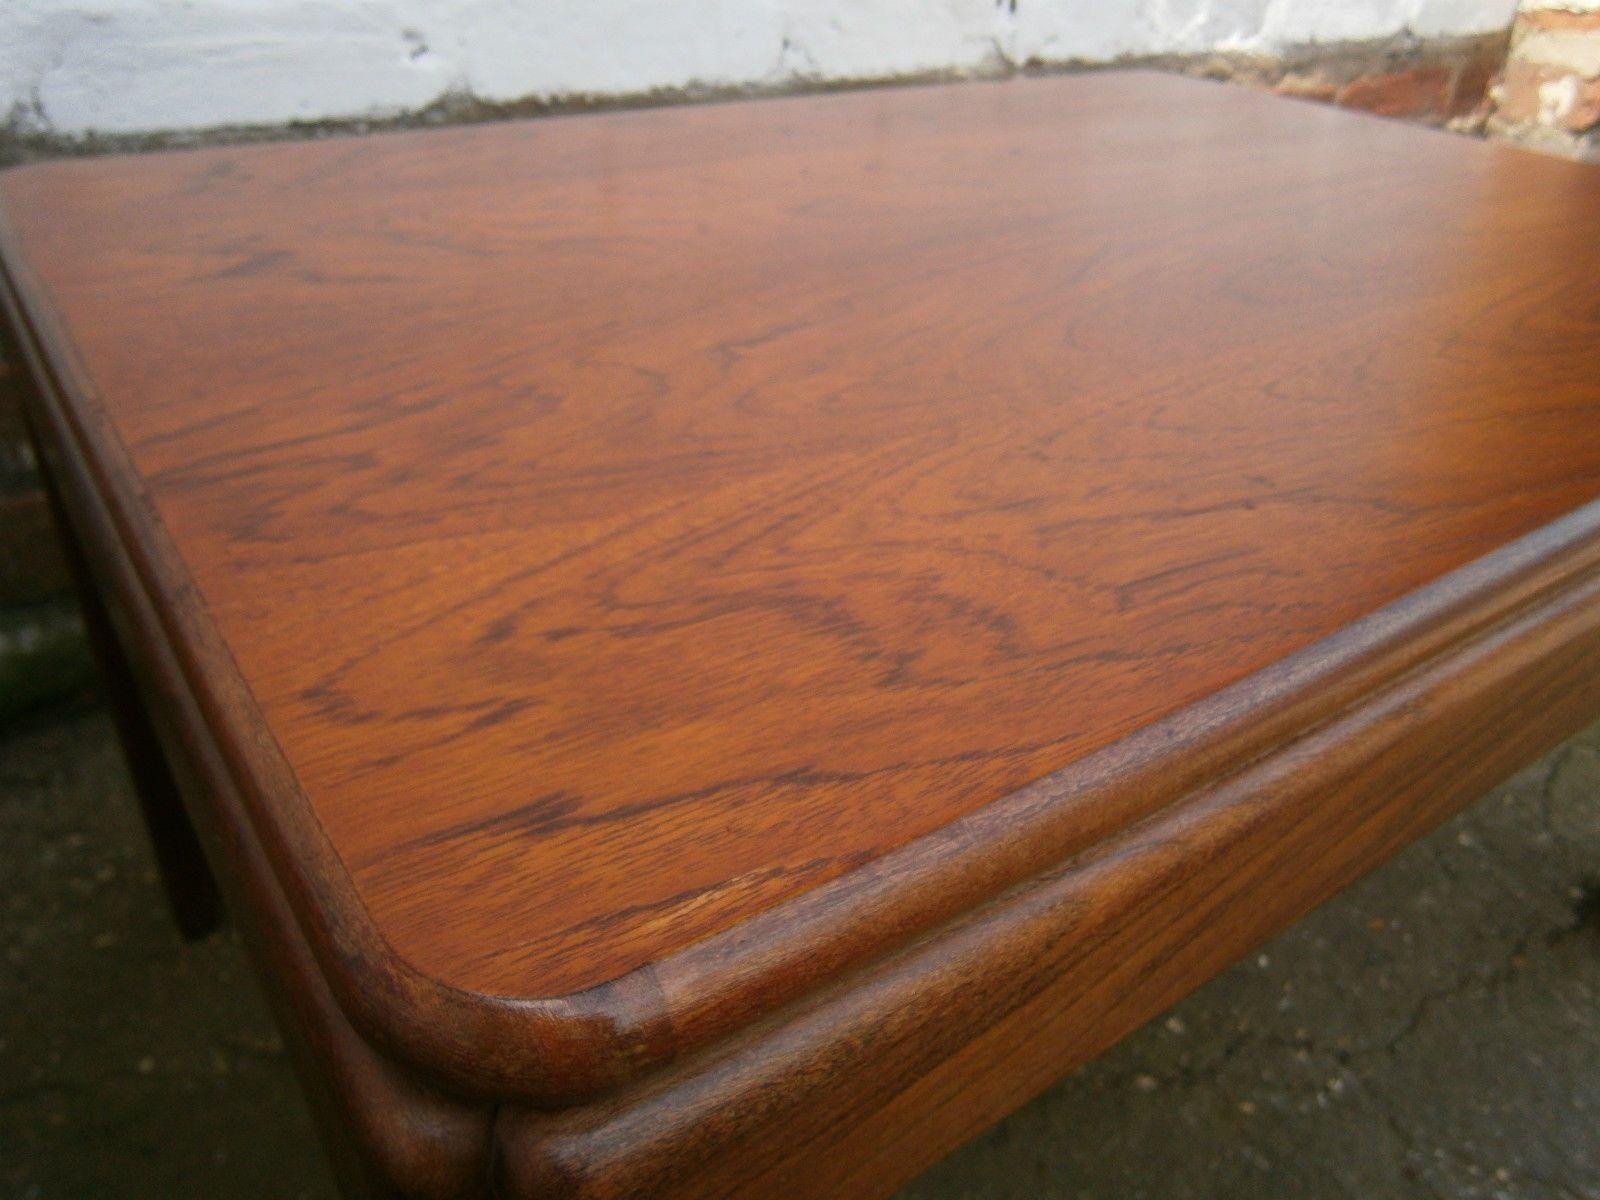 vintage retro mid century g plan teak floating coffee table Scandi